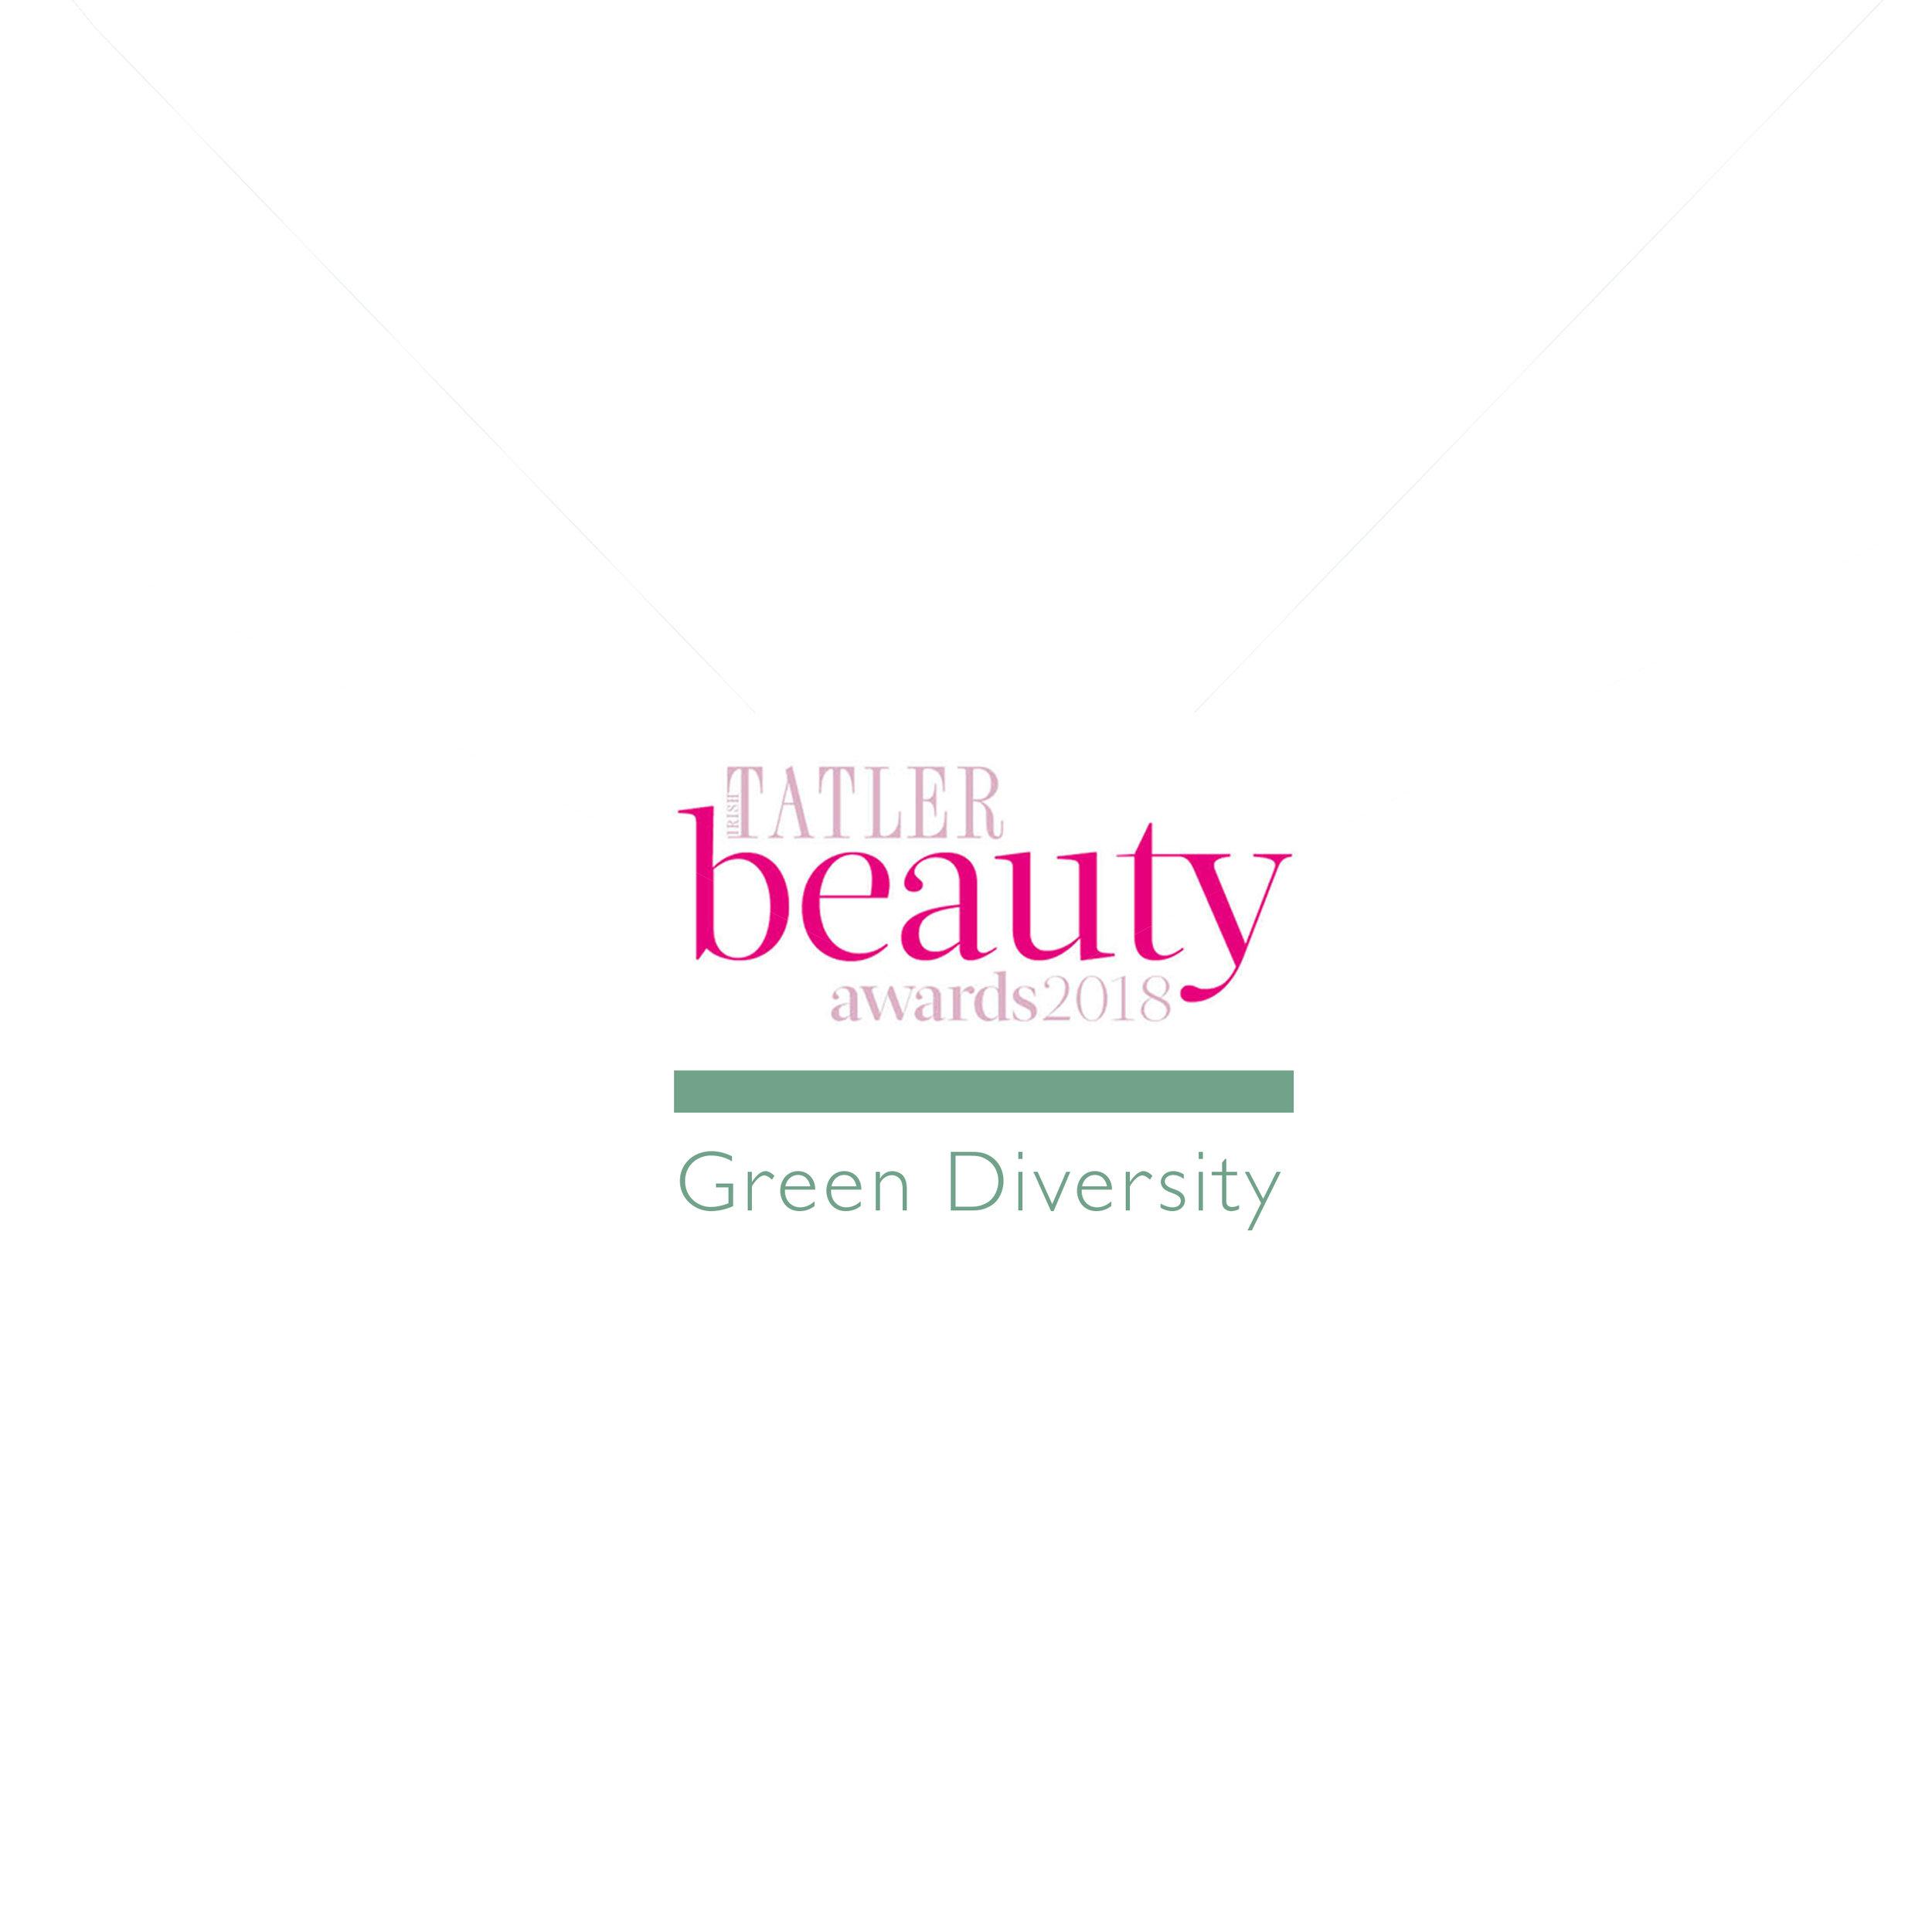 Irish Tatler Green Diversity Award 2018